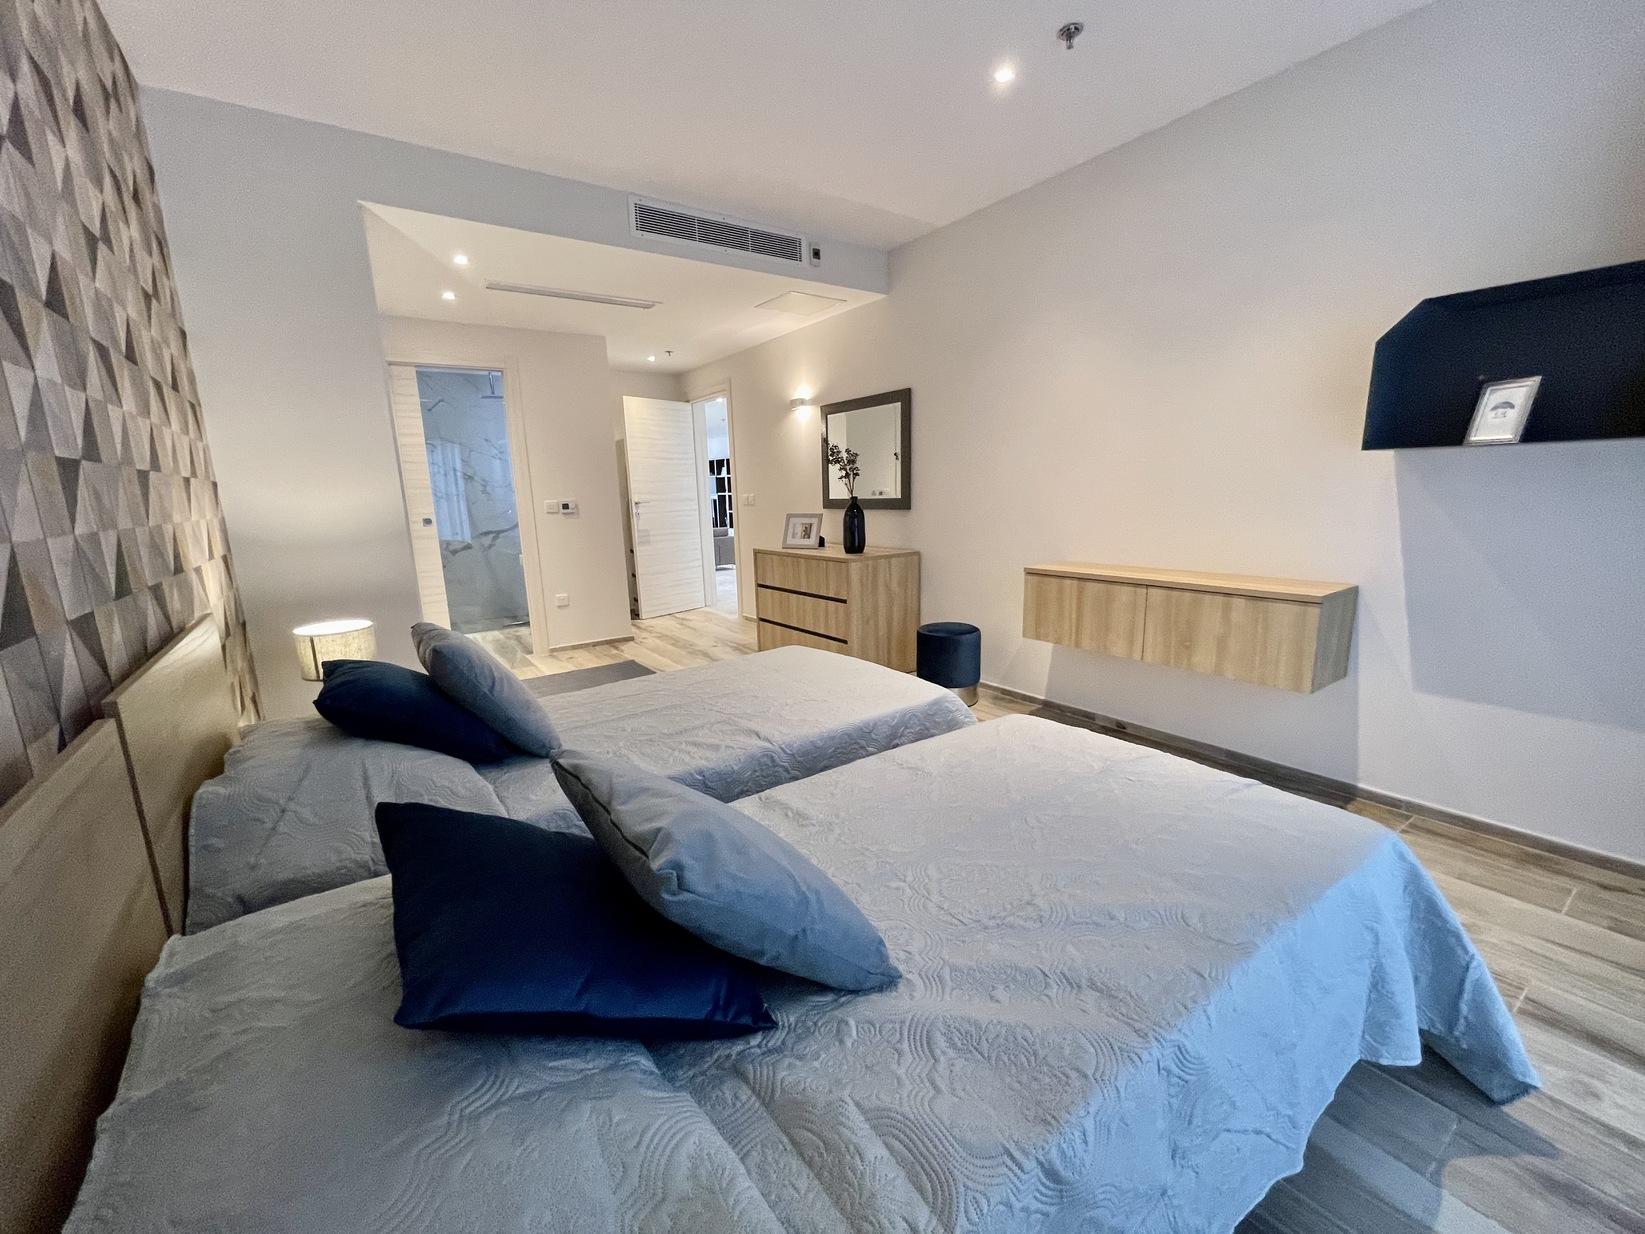 2 bed Apartment For Rent in Sliema, Sliema - thumb 20